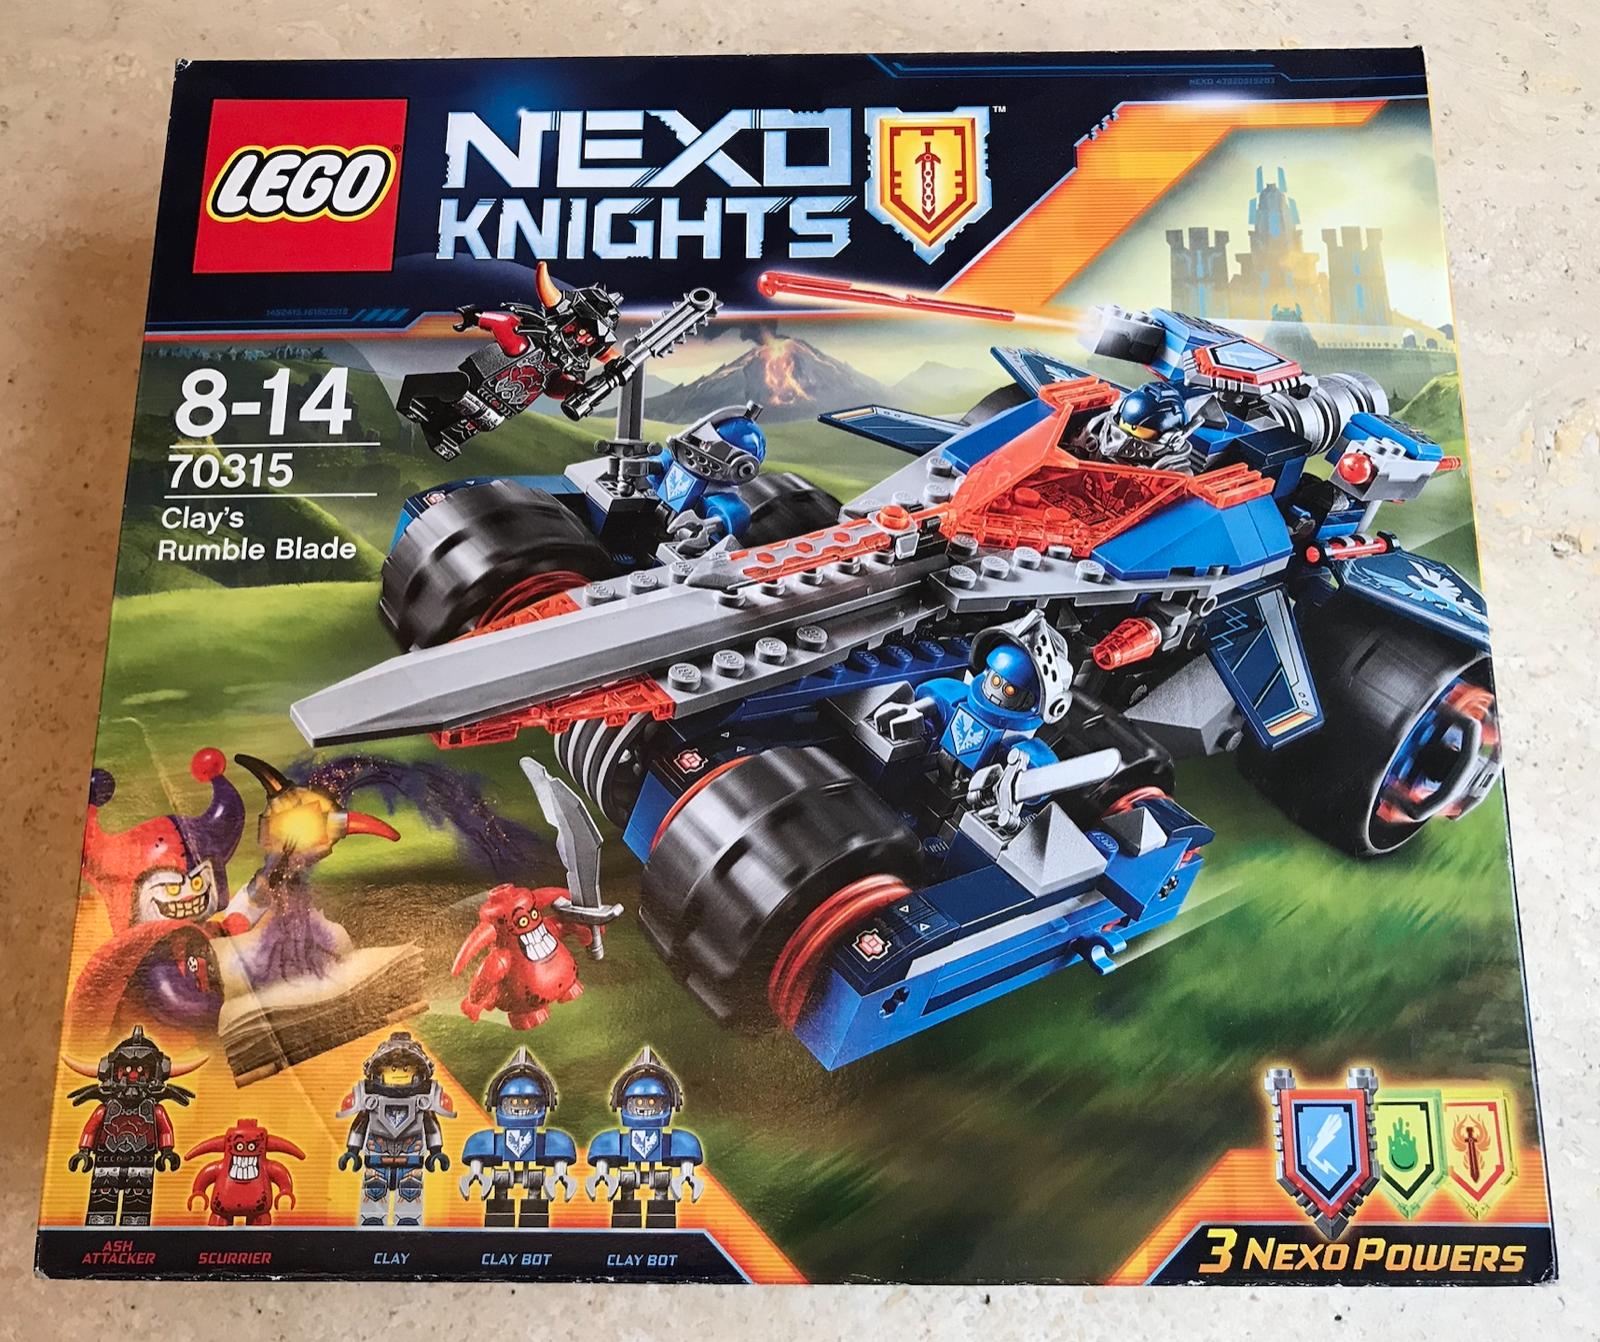 JEU  LEGO NEXO KNIGHTS - L'EPEE RUGISSANTE DE CLAY  - 70315 - RARE